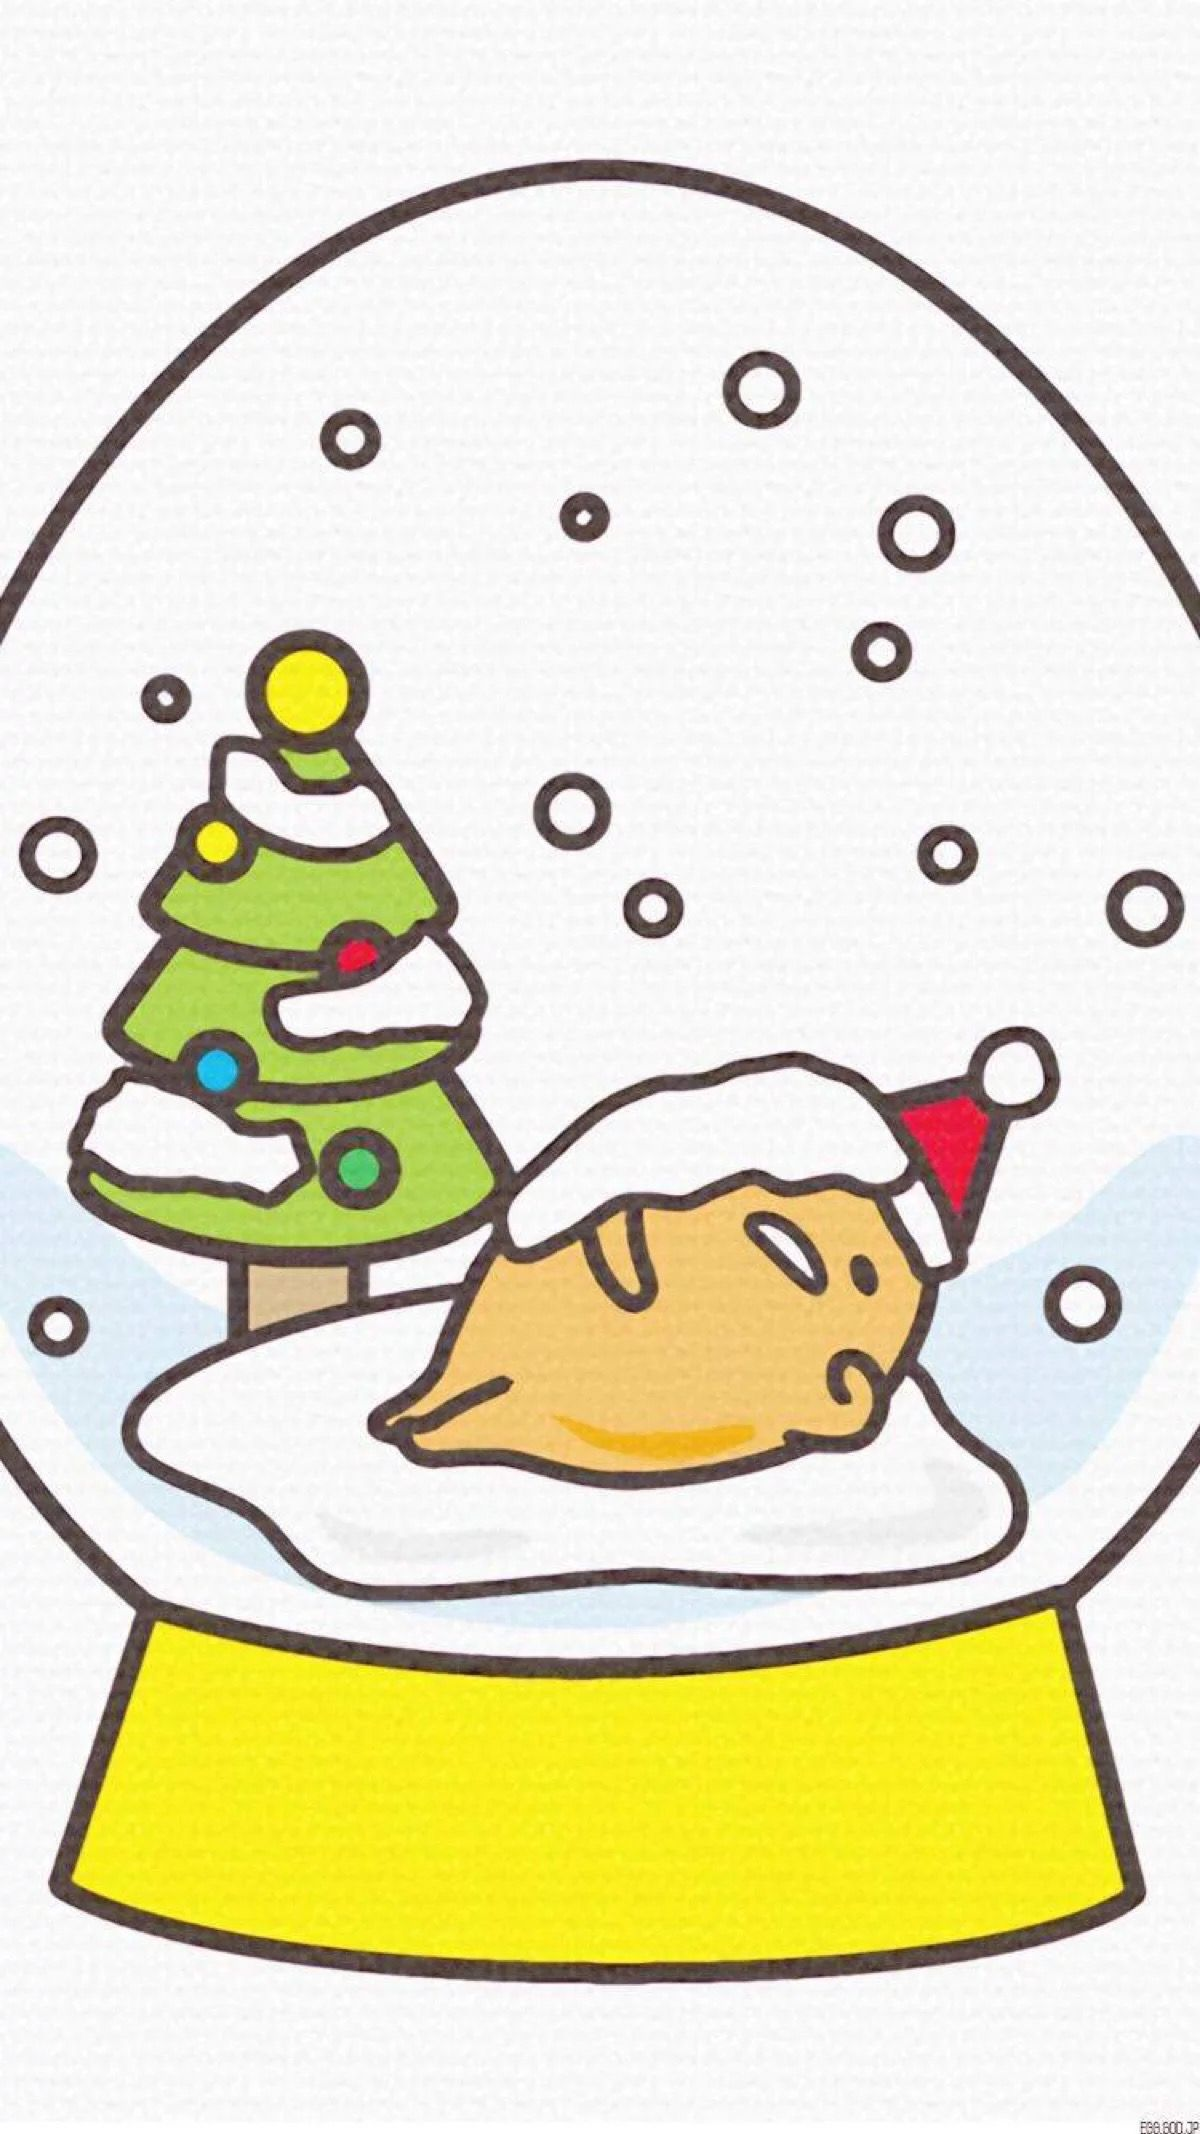 Pin By Pankeaw On Wallpaper Sanrio